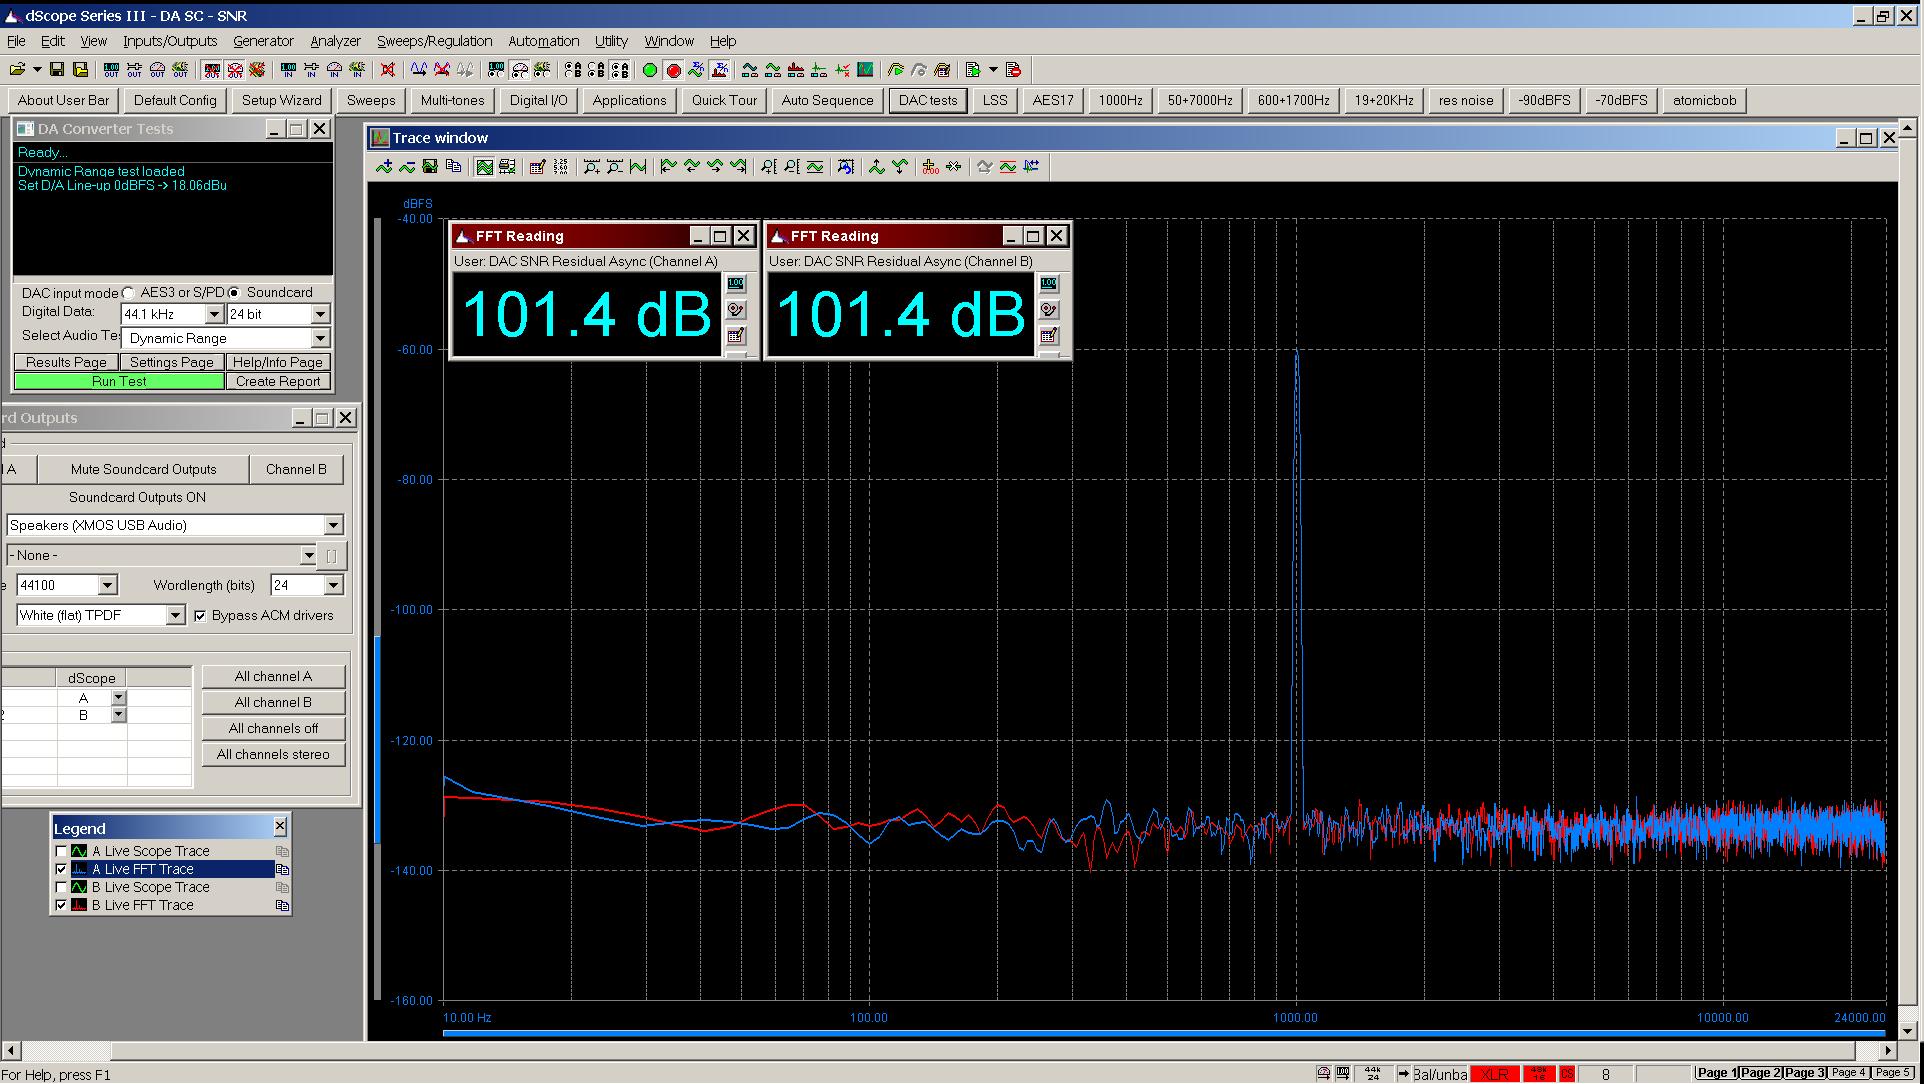 20181227-14 convert2 Bal dynamic range - USB +18dBu.PNG